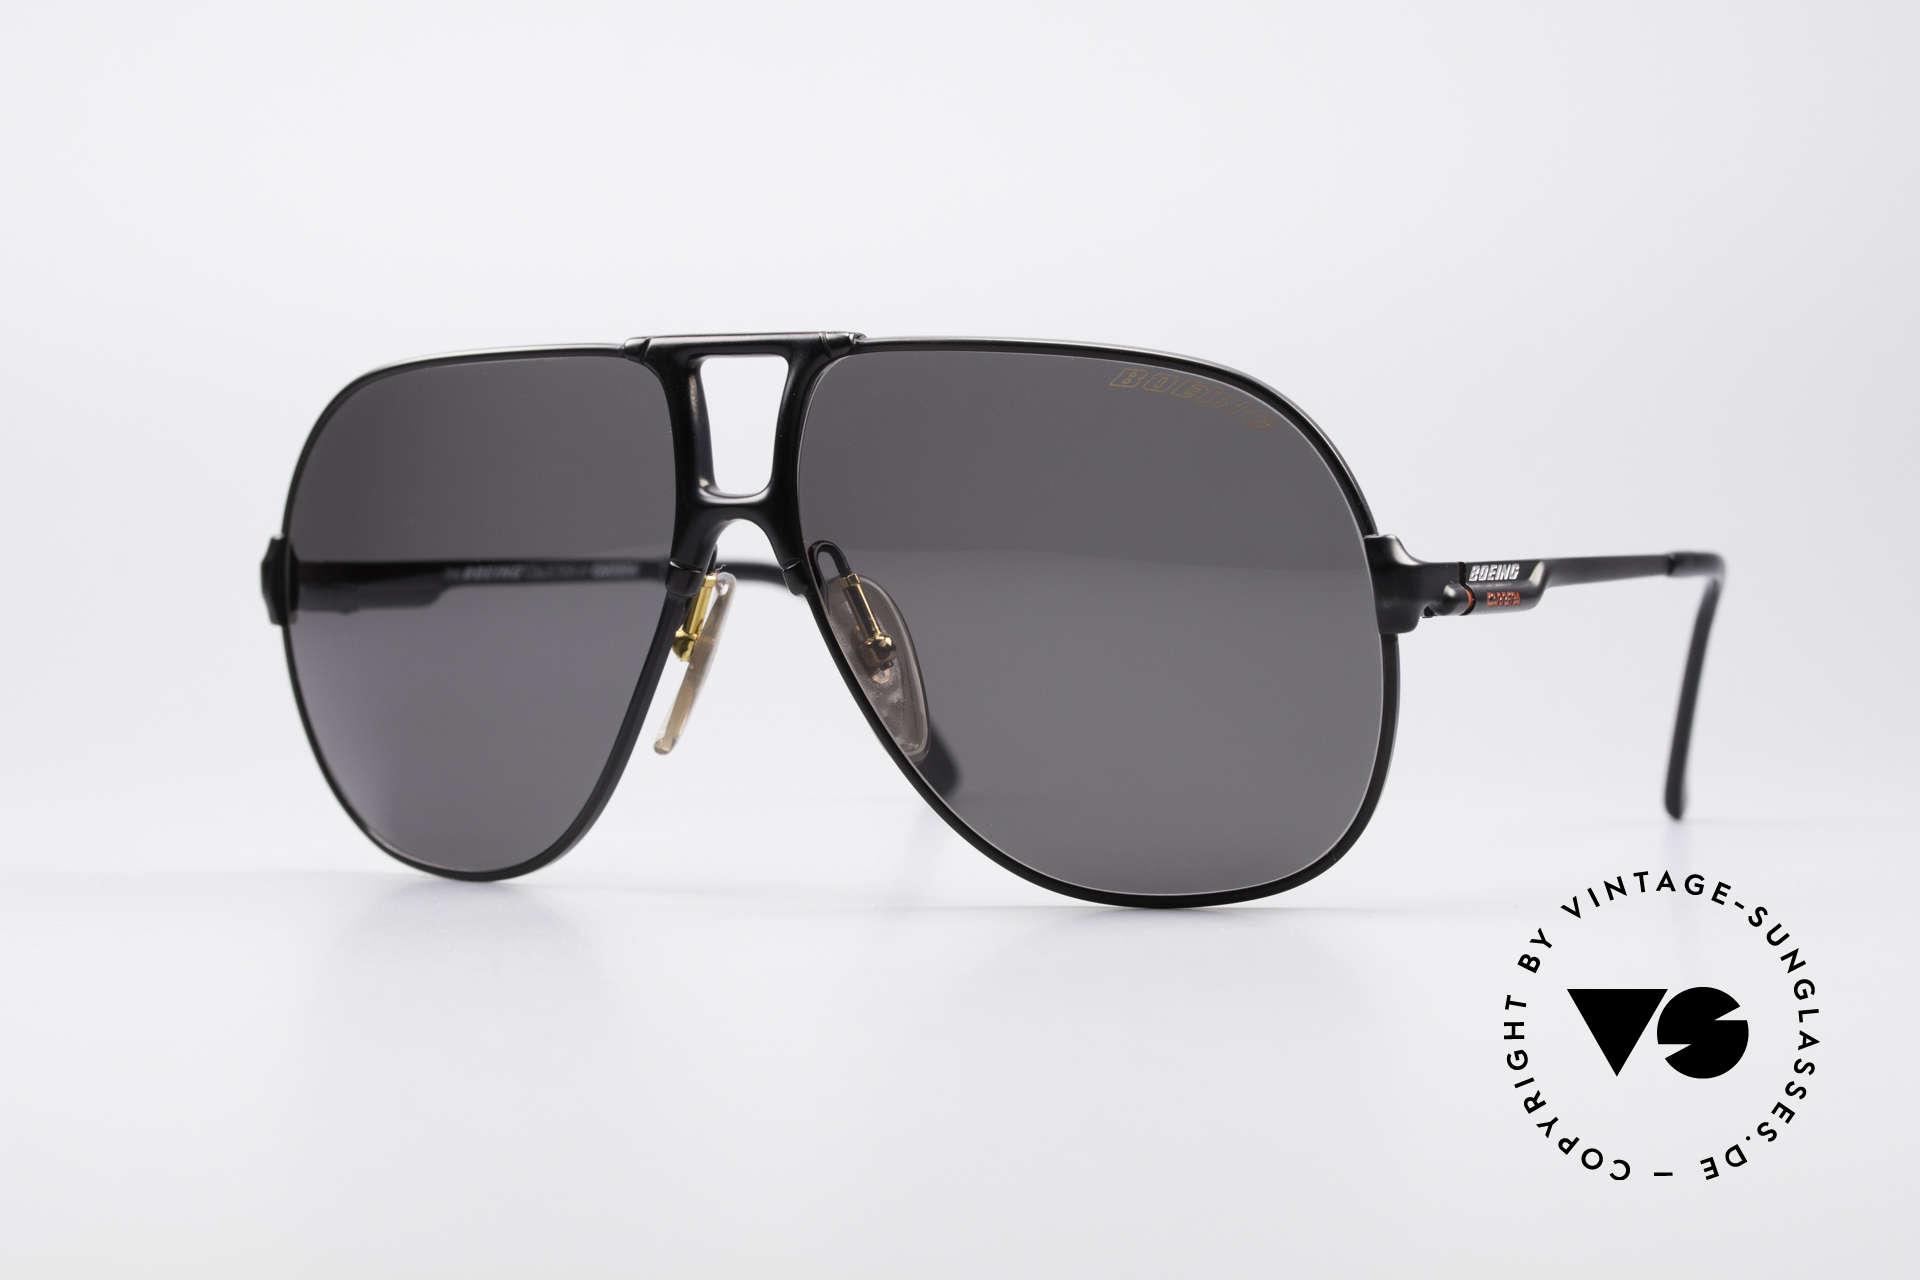 880d016f86 Sunglasses Boeing 5700 Vintage 80 s Pilots Shades